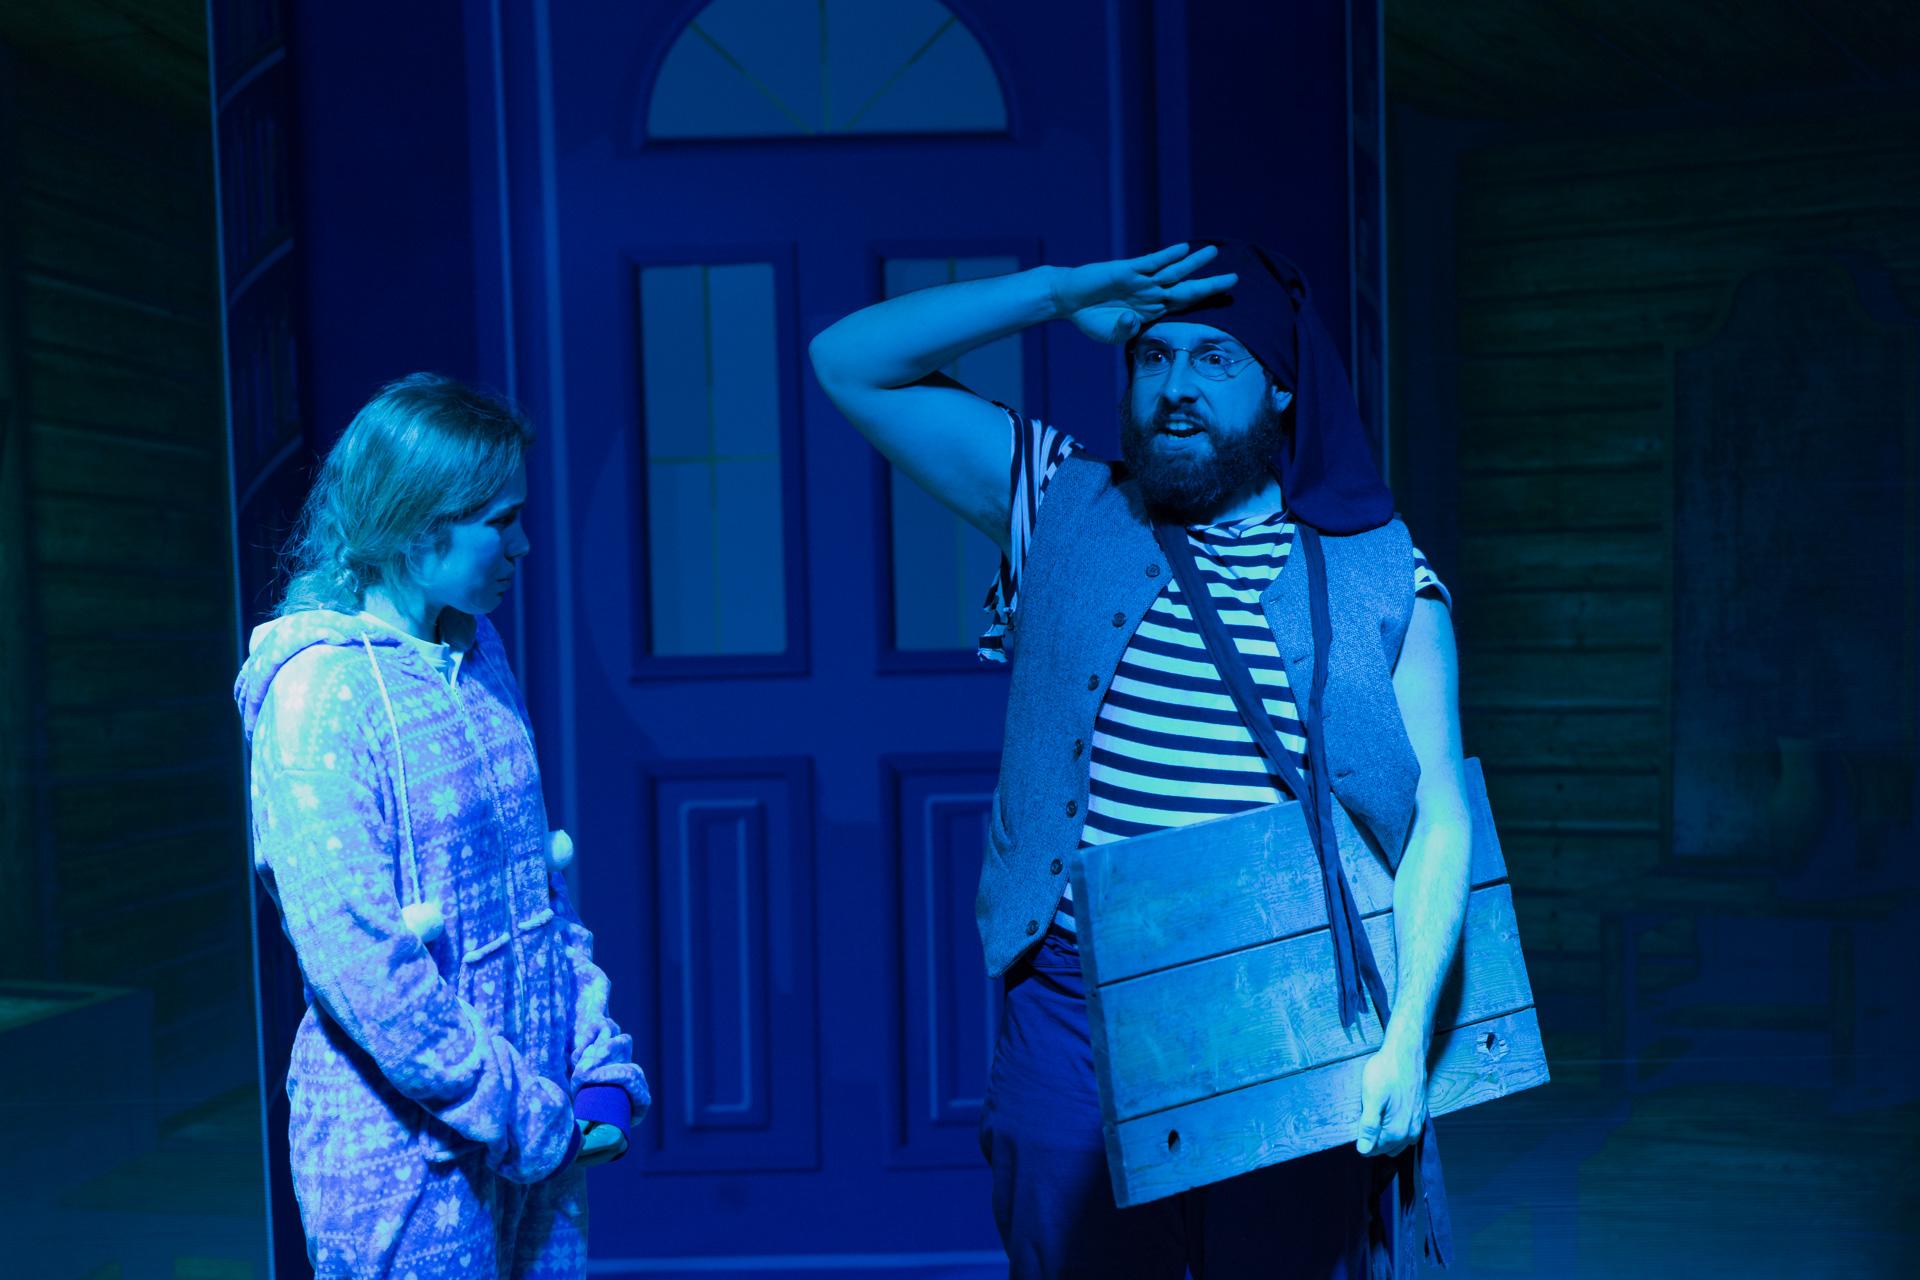 Carolina Sala | Mirko Bottega | Centro Teatrale Da Ponte | Viola e le parole | Edoardo Fainello